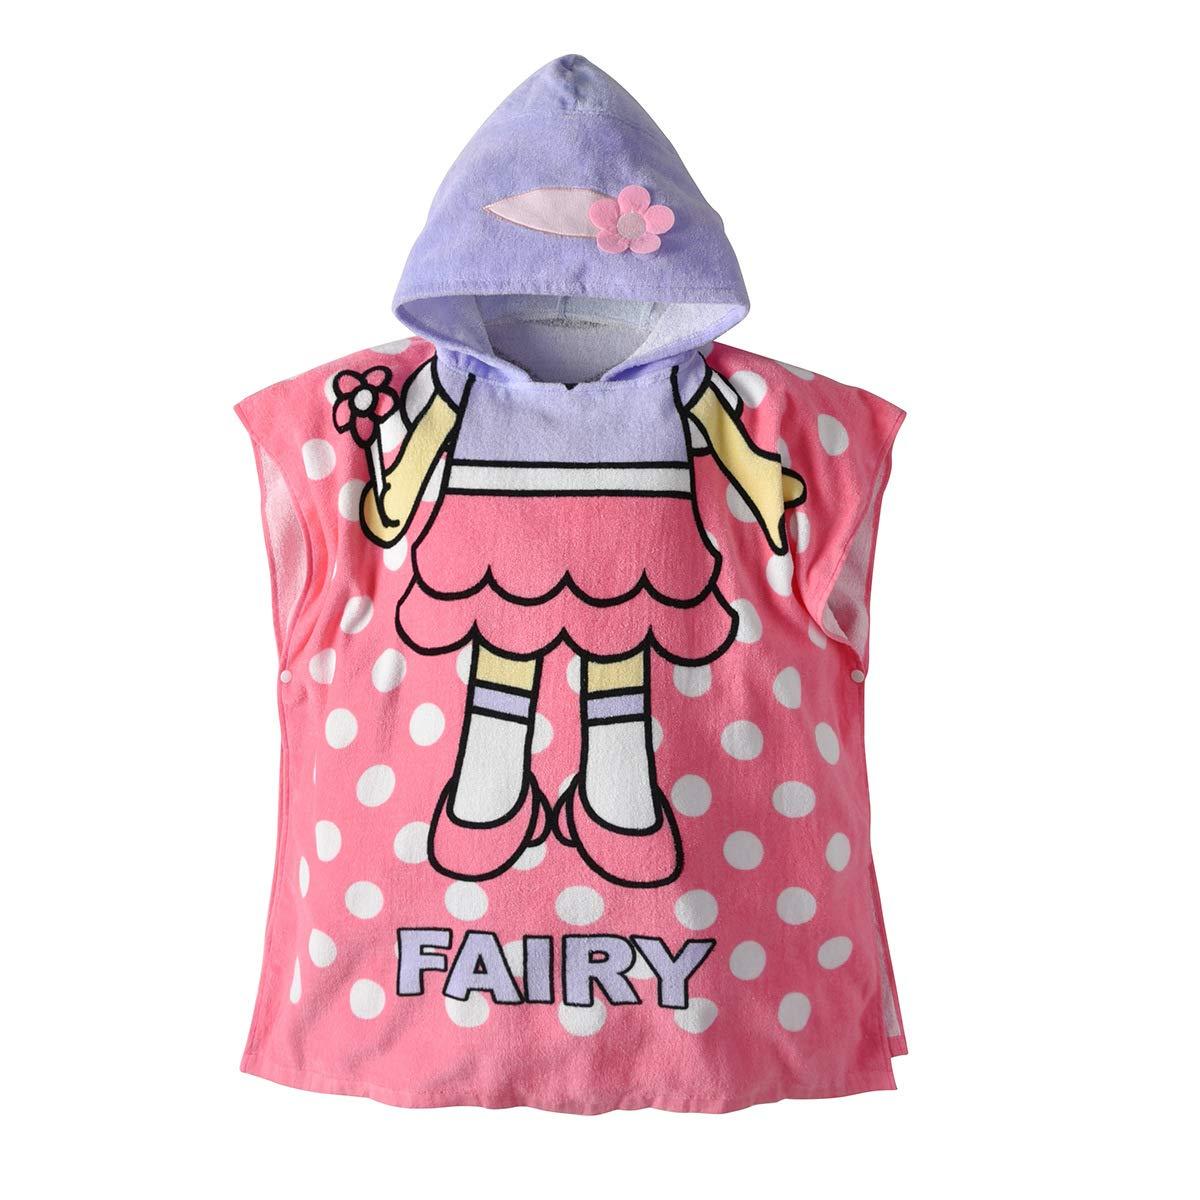 XXRBB Large Soft Hooded Towel Baby Cotton Poncho Robe Super Absorbent Hypoallergenic for Swim Bath Beach Bathtime,150x65cm(59x26inch) by XXRBB